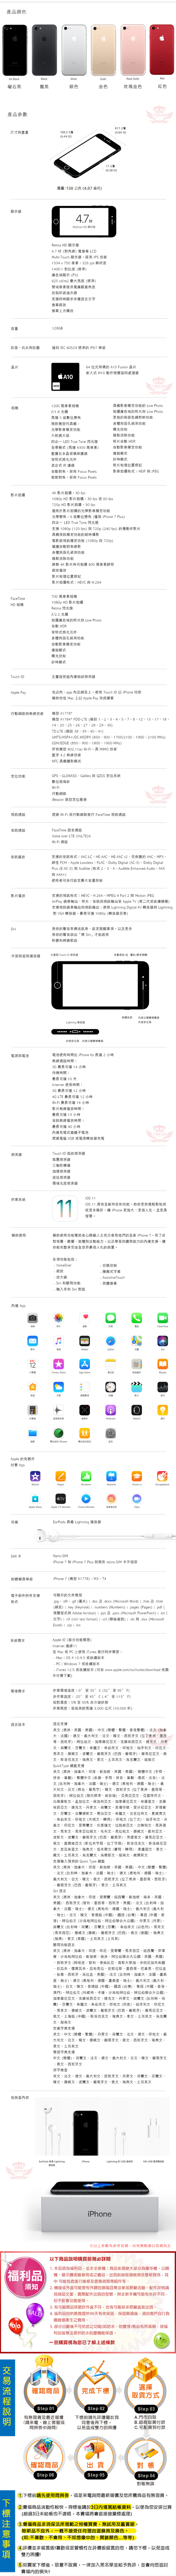 iPhone 7 128G【福利品】送行動電源+鋼化膜+空壓殼☆手機批發網☆5S、6S、6Plus 、I7、7PLUS